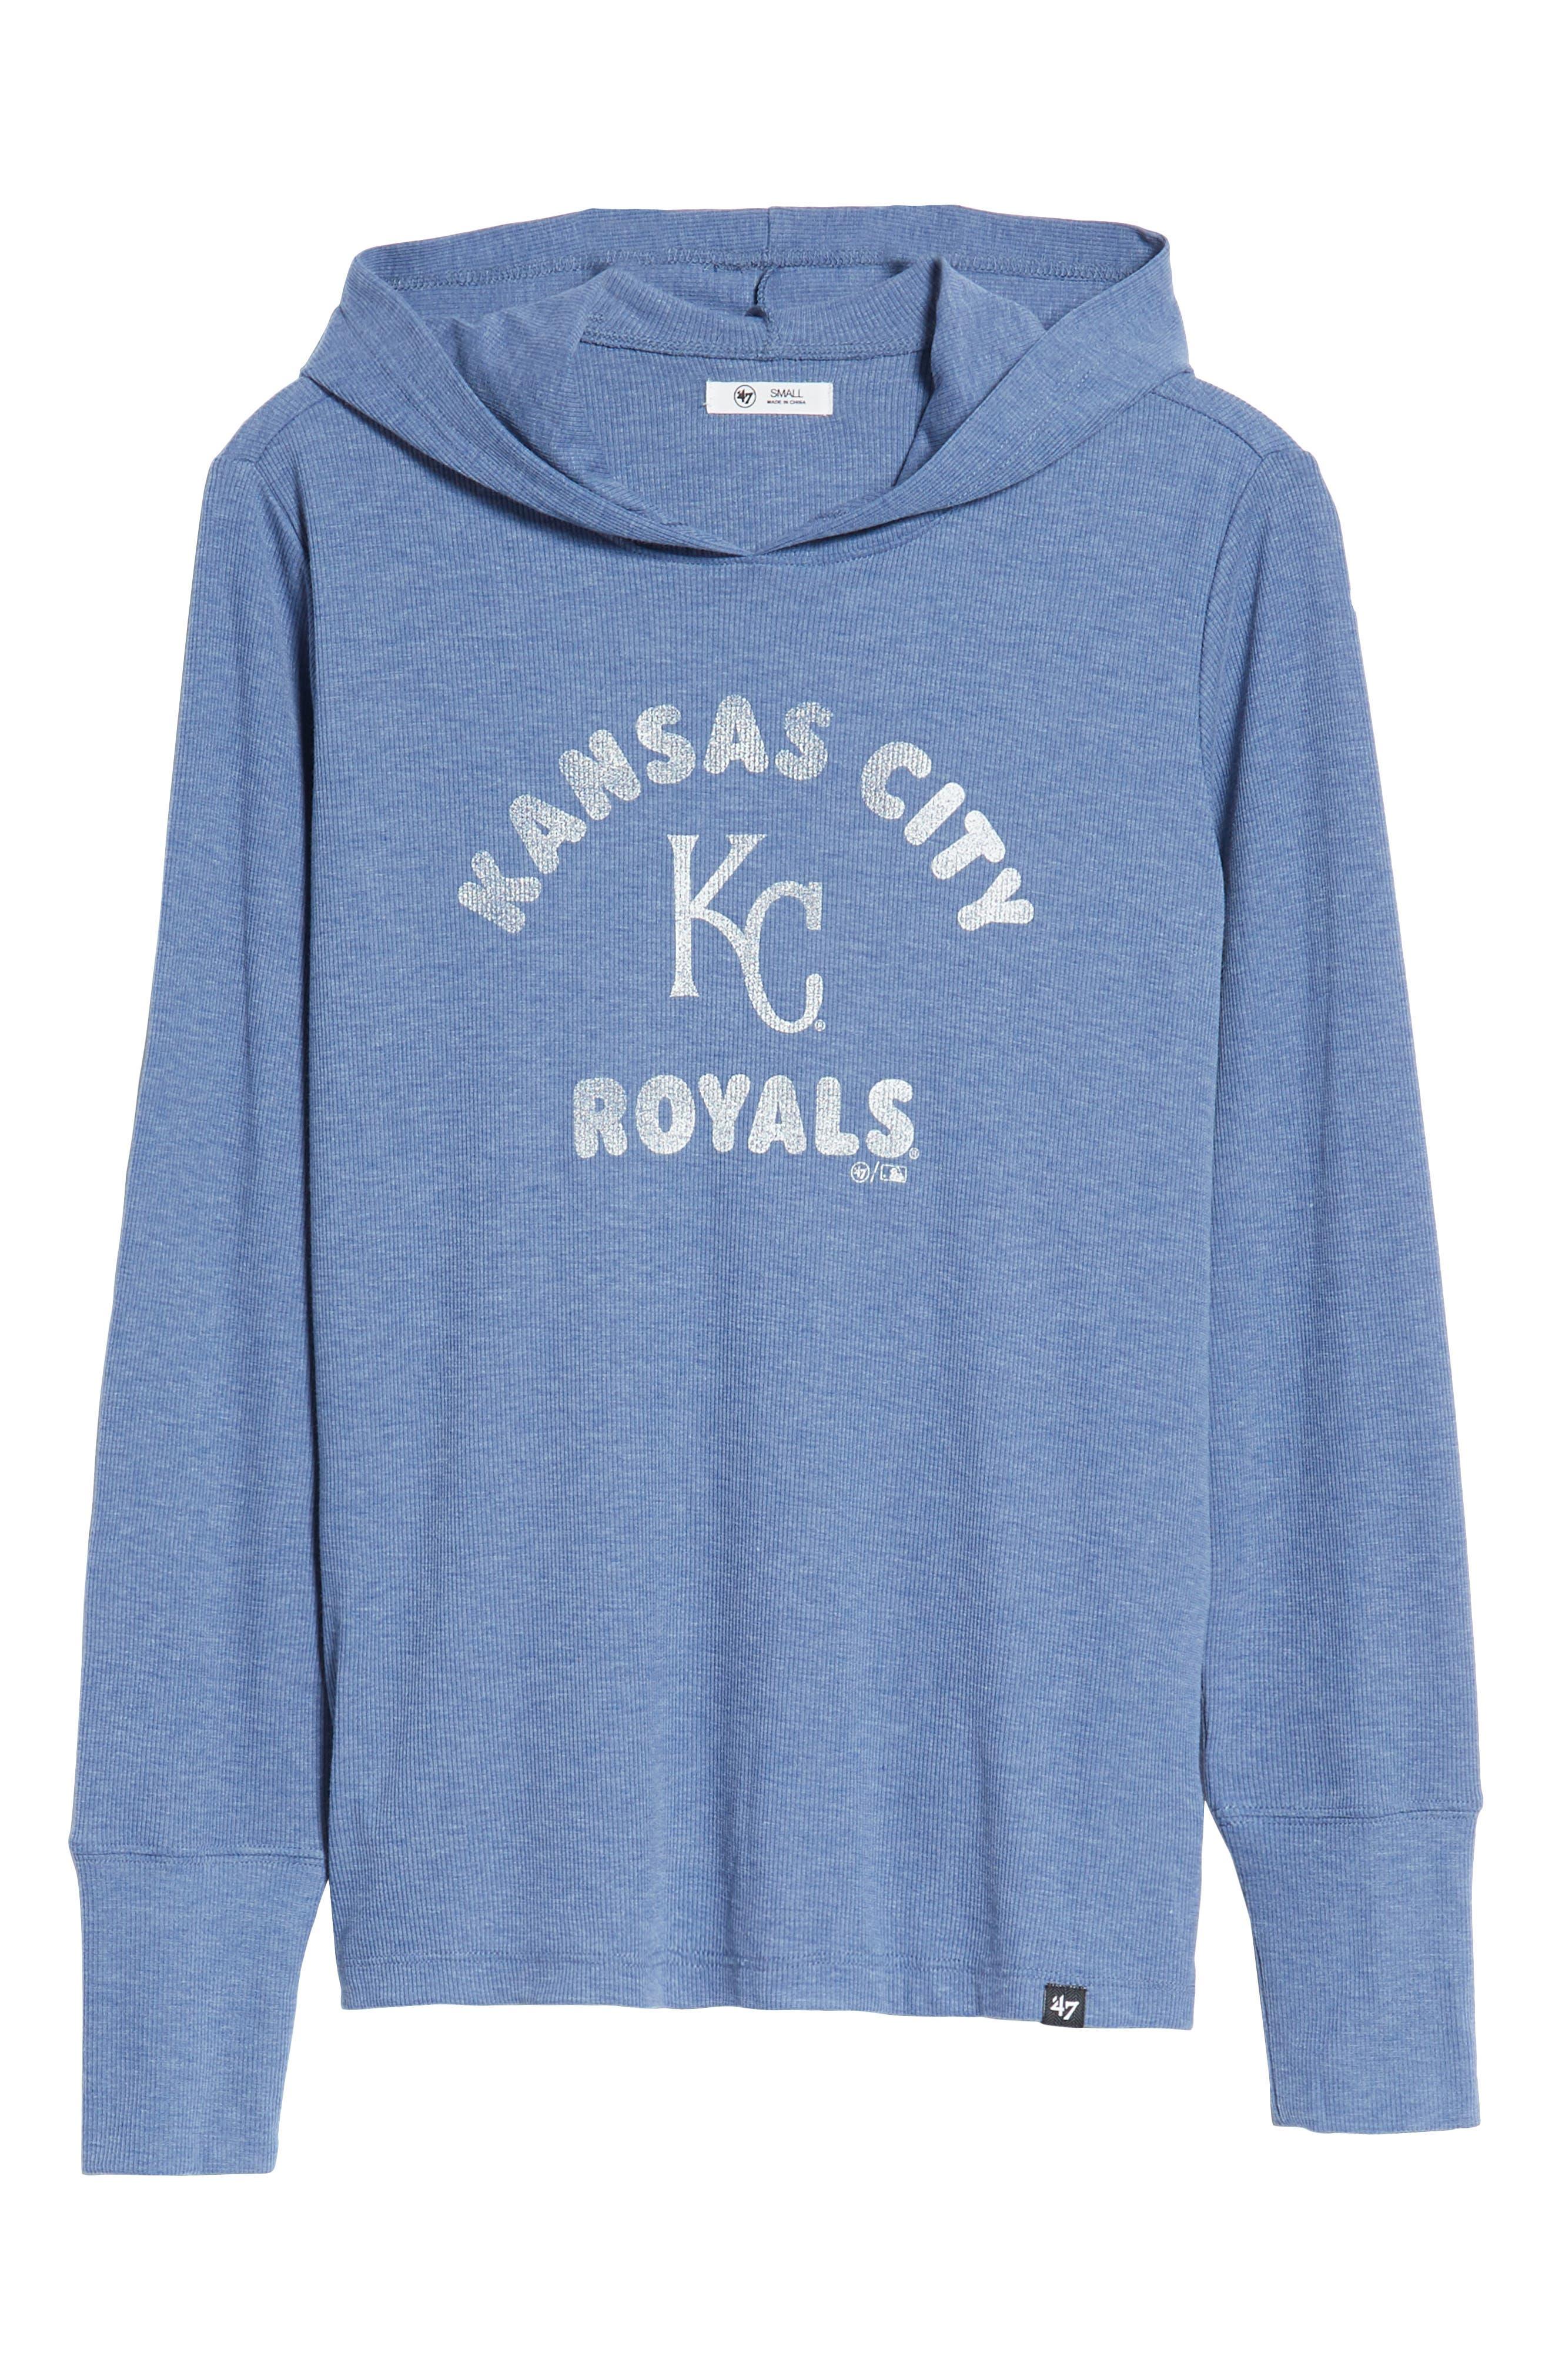 Campbell Kansas City Royals Rib Knit Hooded Top,                             Alternate thumbnail 7, color,                             Bleacher Blue